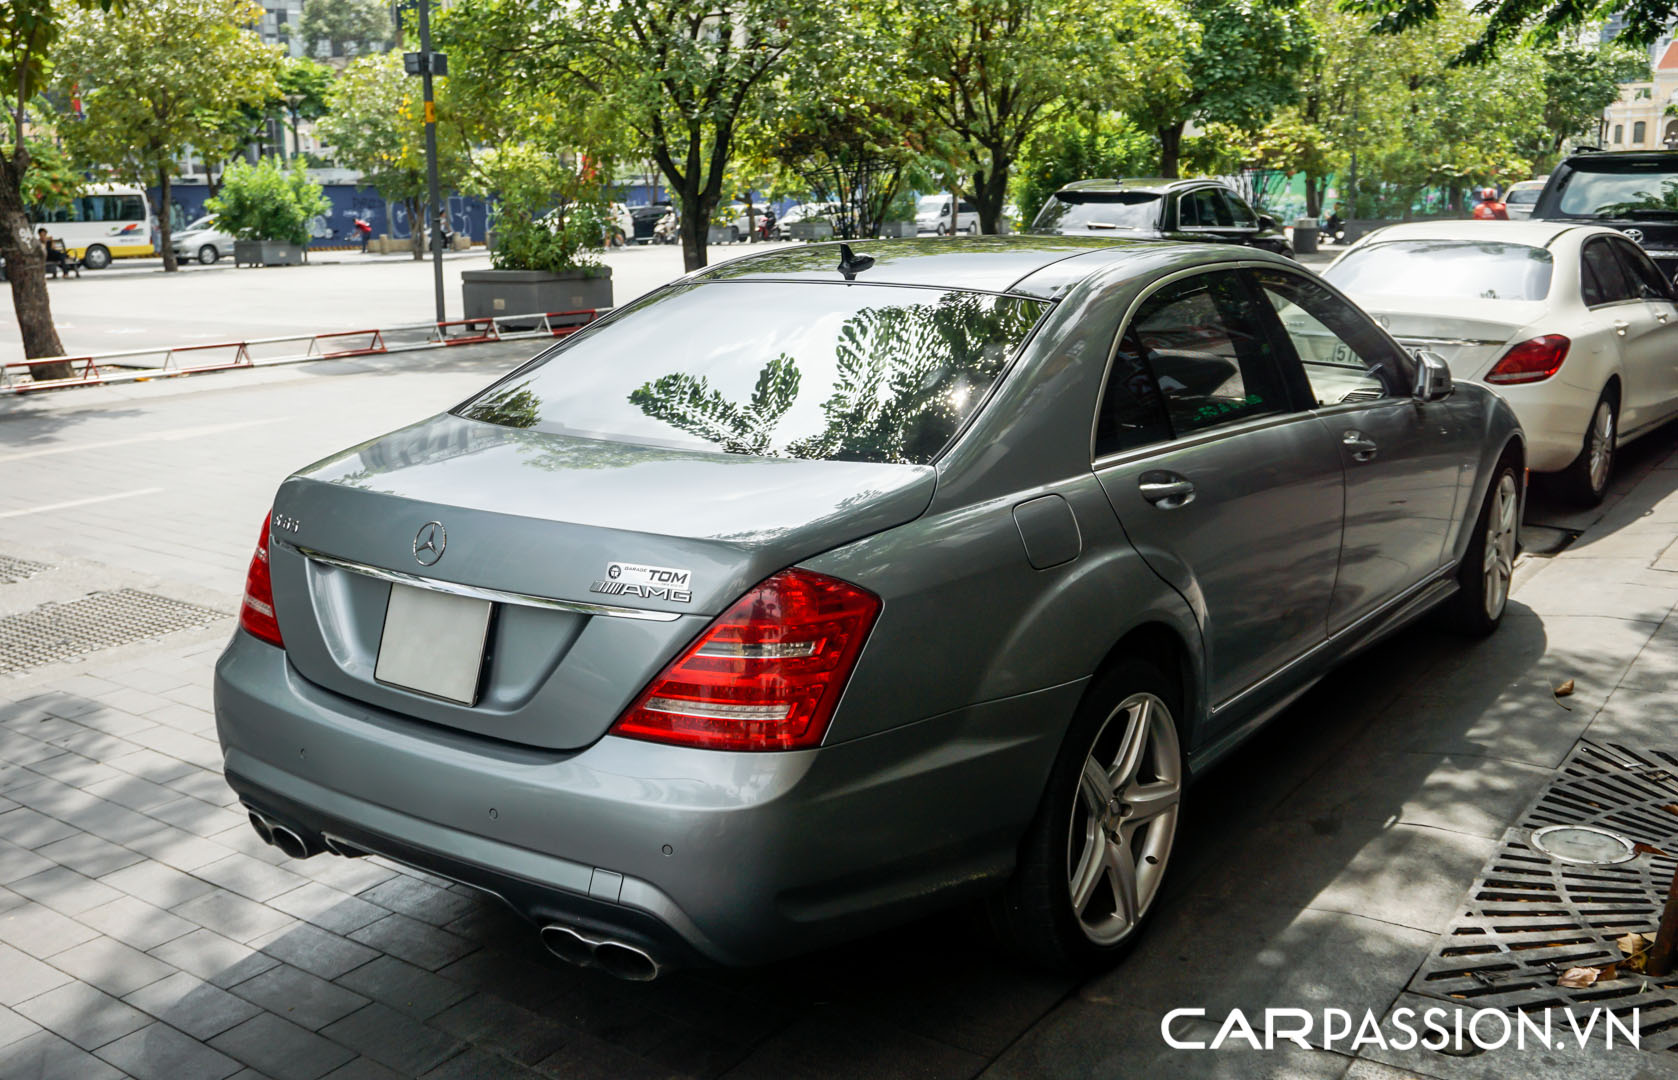 CP-Mercedes-Benz S65 AMG (1).jpg